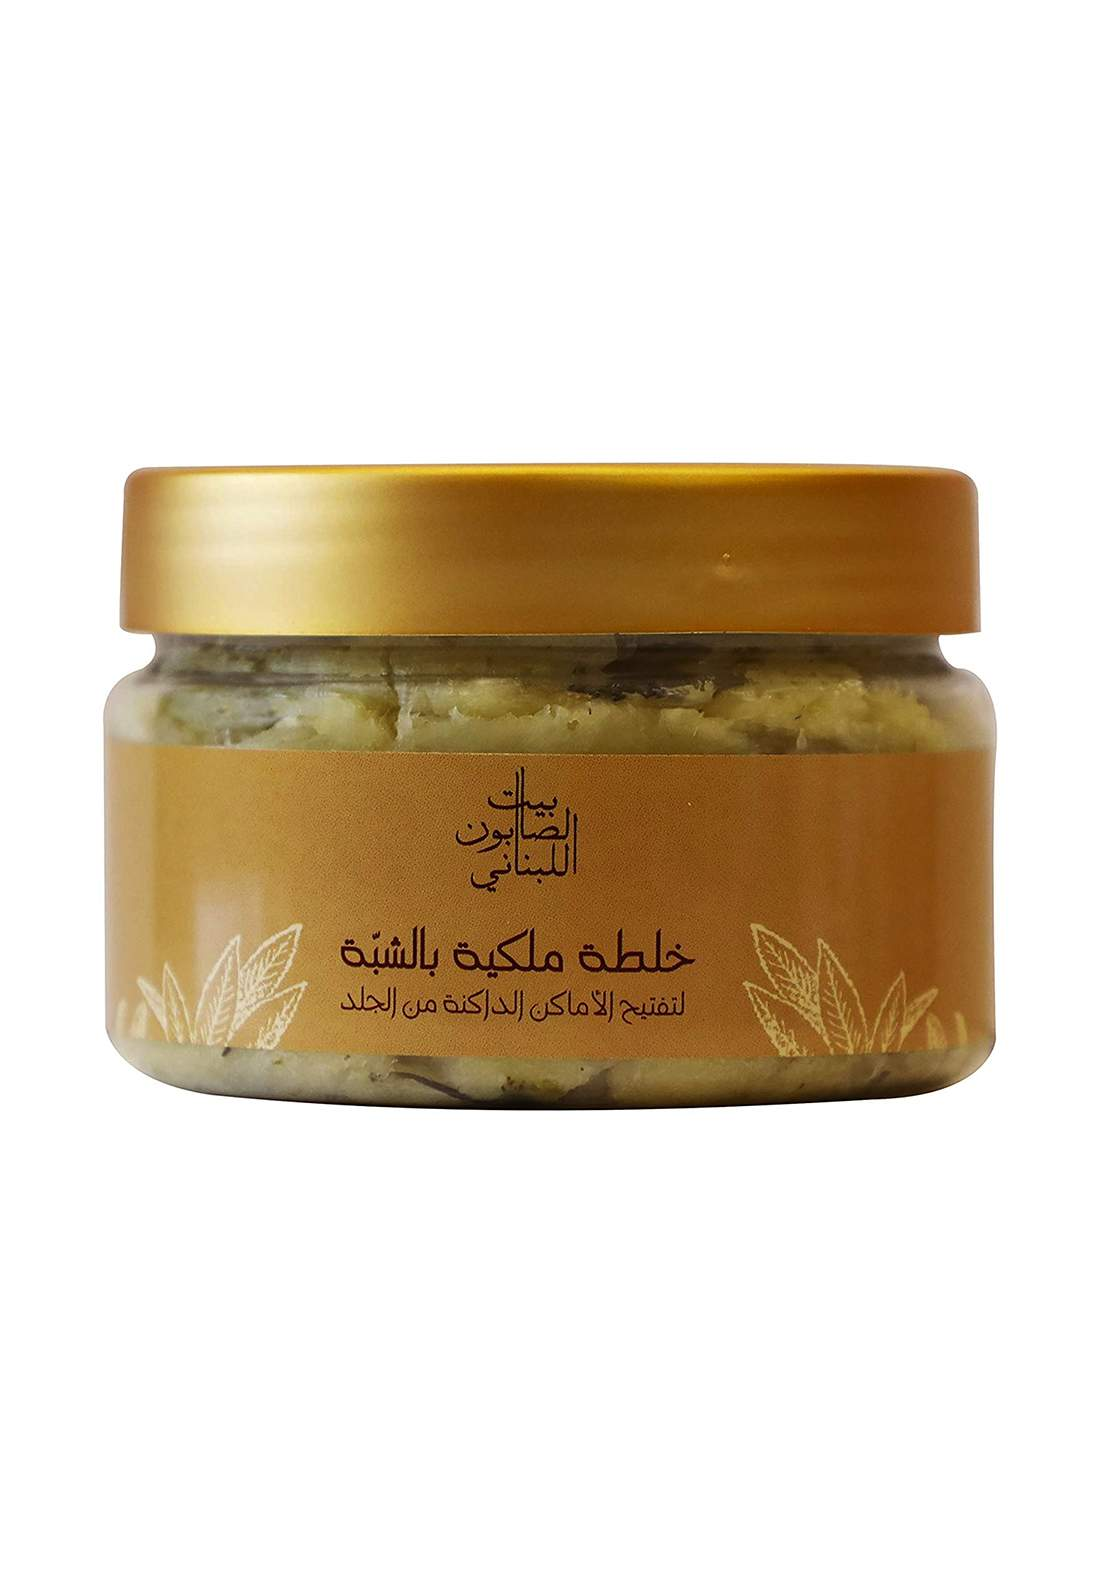 Bayt Alsaboun Alloubnani-317457 Alum Royal Formula 300g كريم